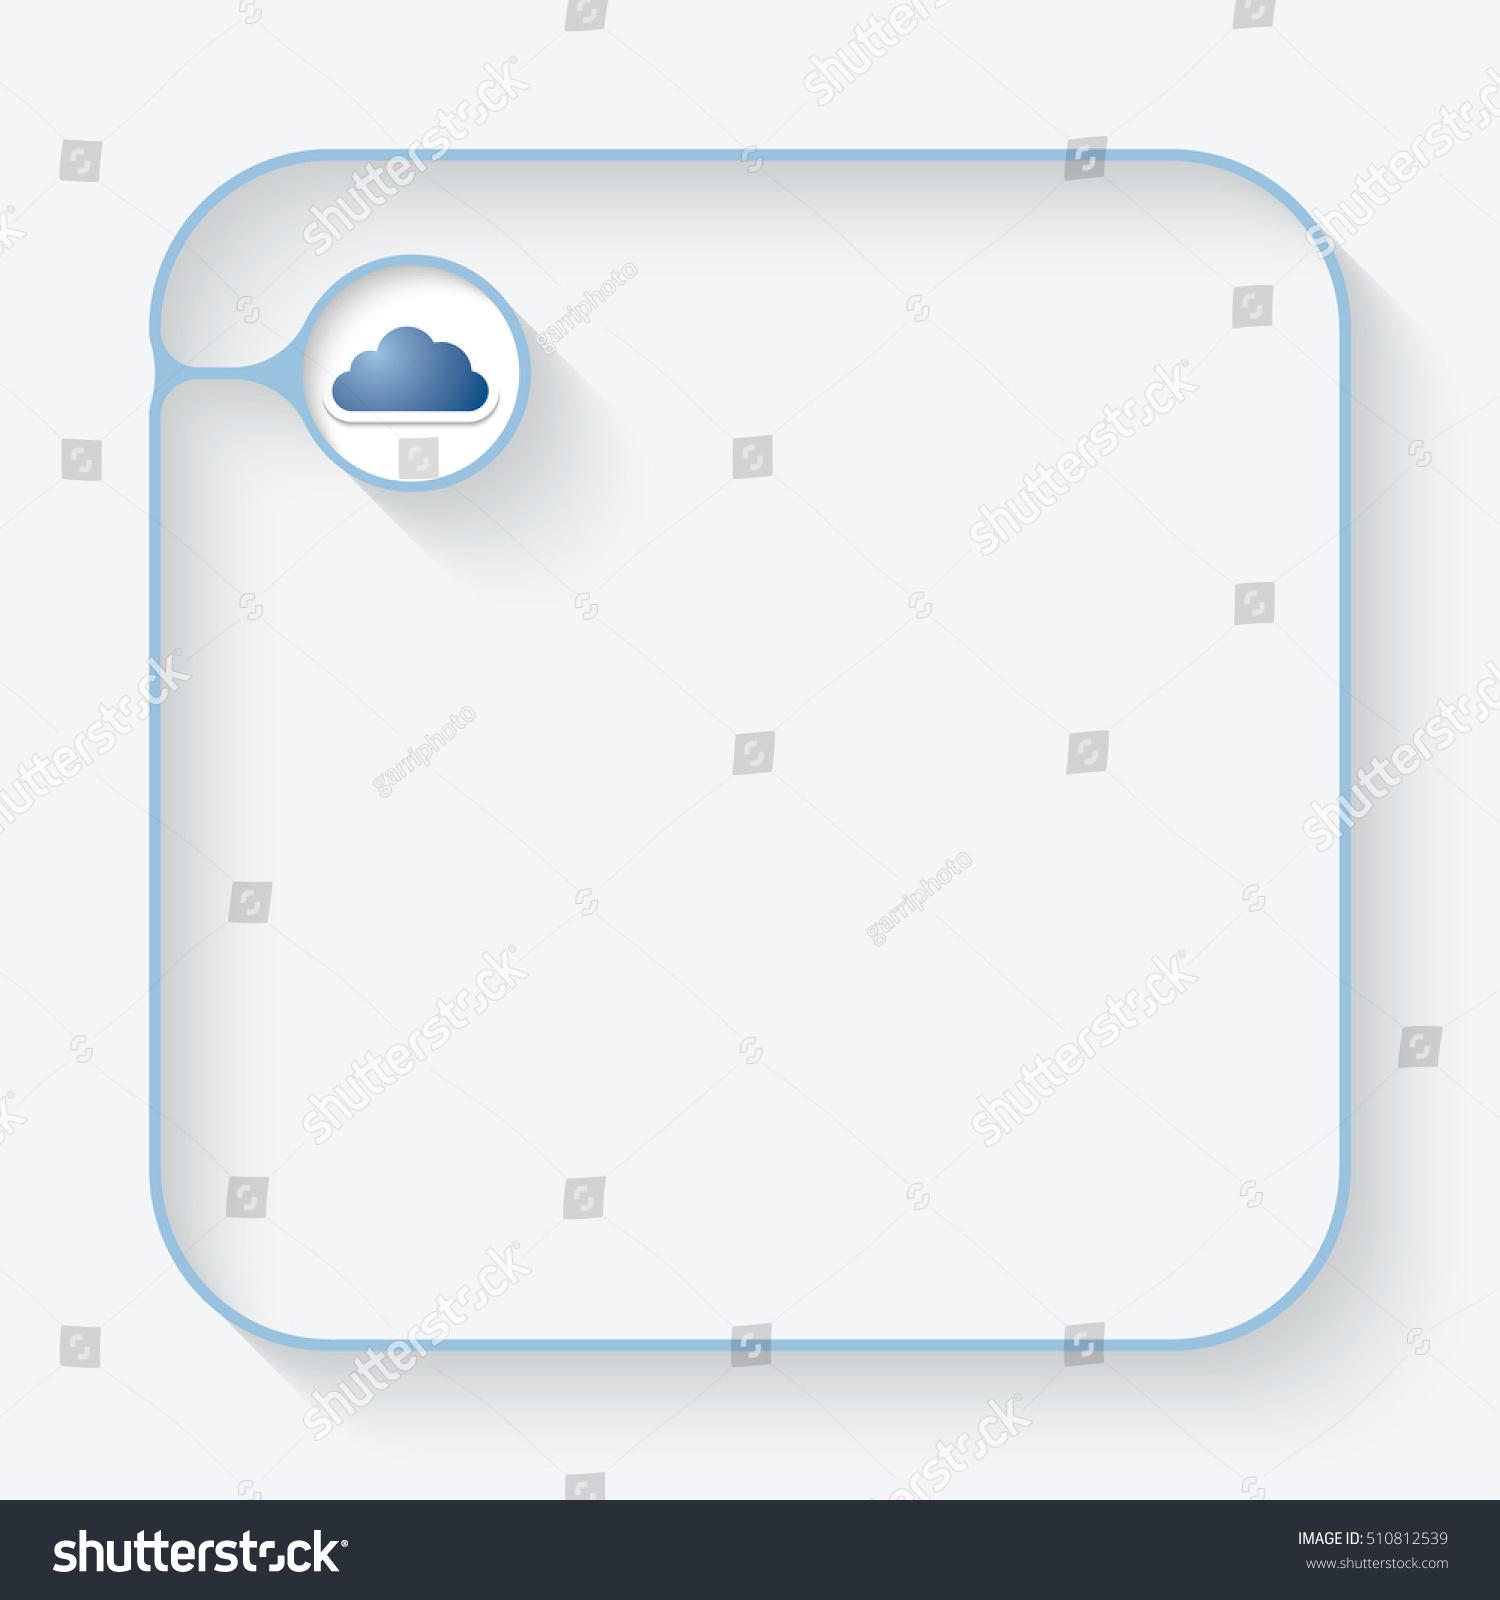 Blue text box cloud symbol stock vector 510812539 shutterstock a blue text box with and cloud symbol biocorpaavc Gallery